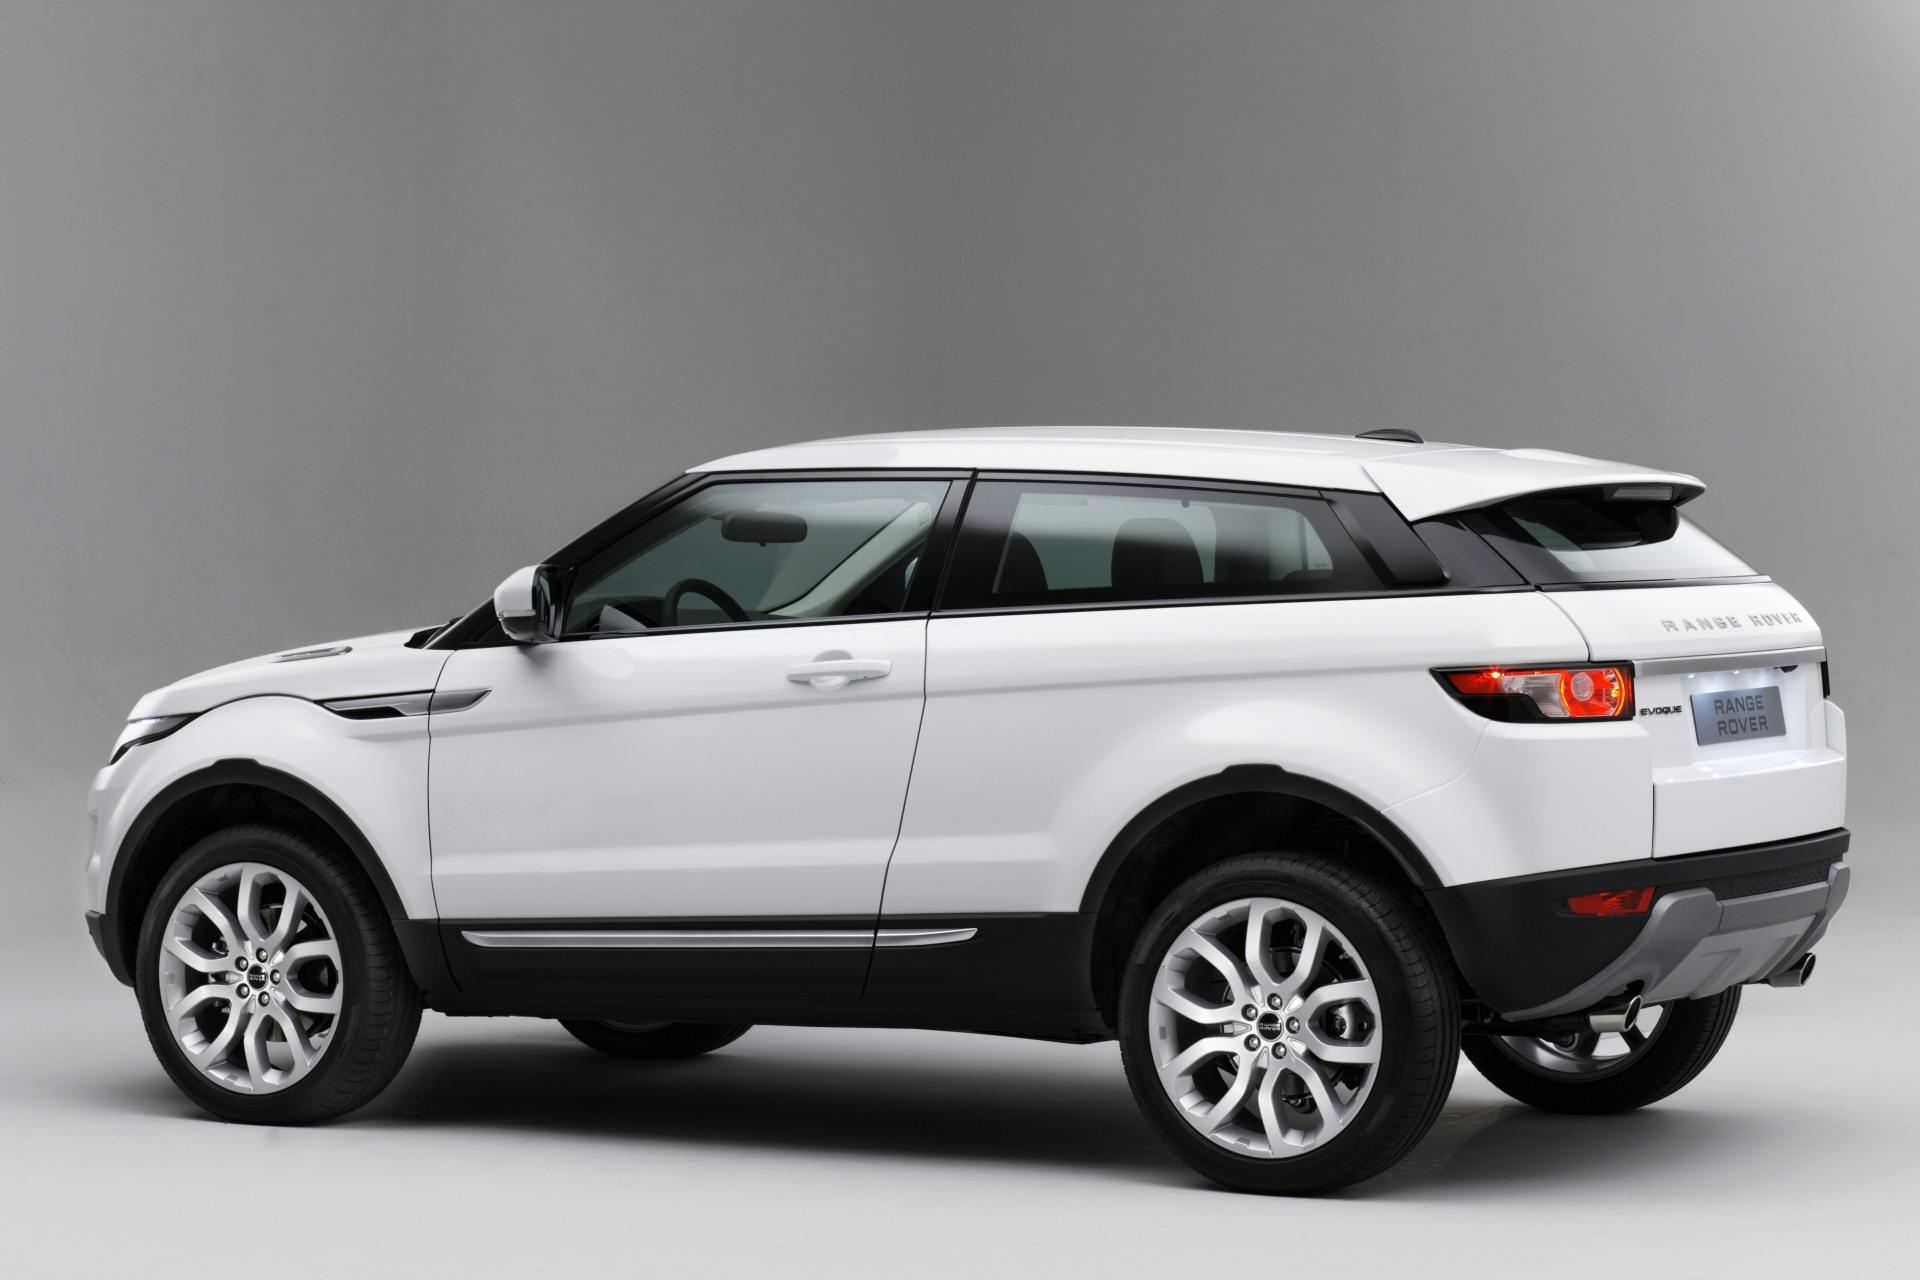 https://www.conceptcarz.com/images/Land%20Rover/2011-Land-Rover-Range-Rover_Evoque-09.jpg